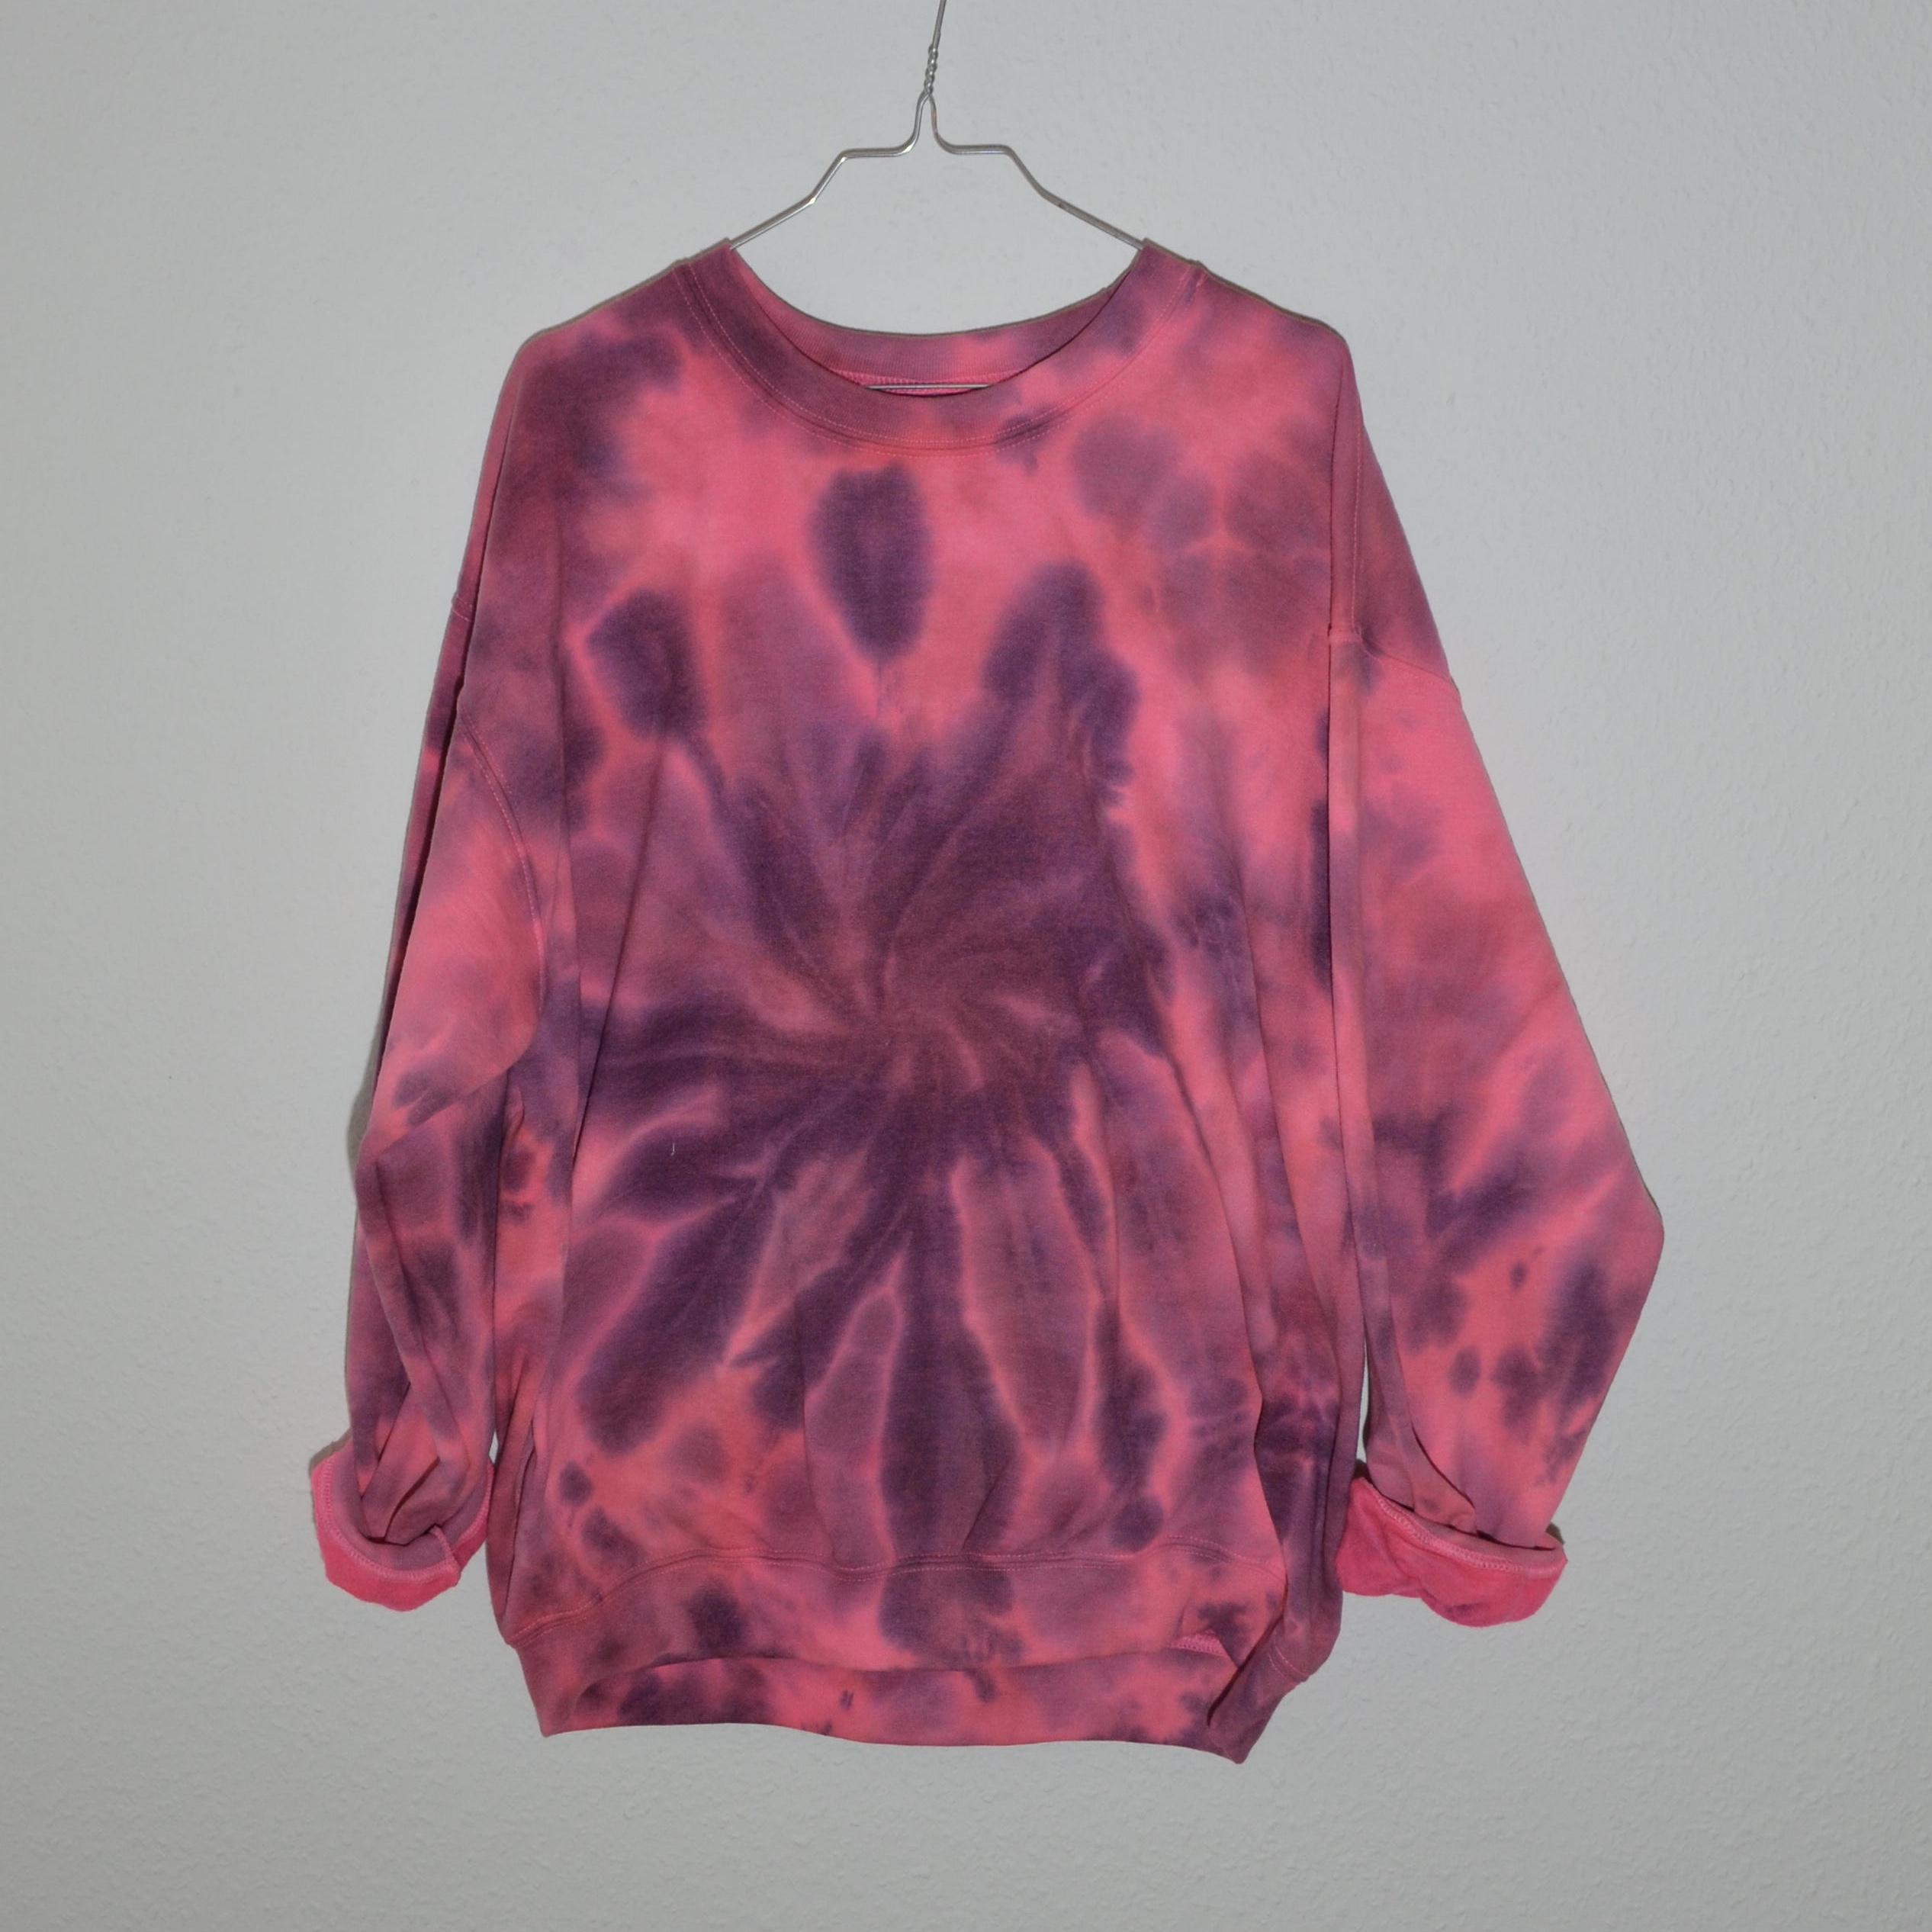 Batik / Tie-Dye Sweater Crazy Pink – Handmade